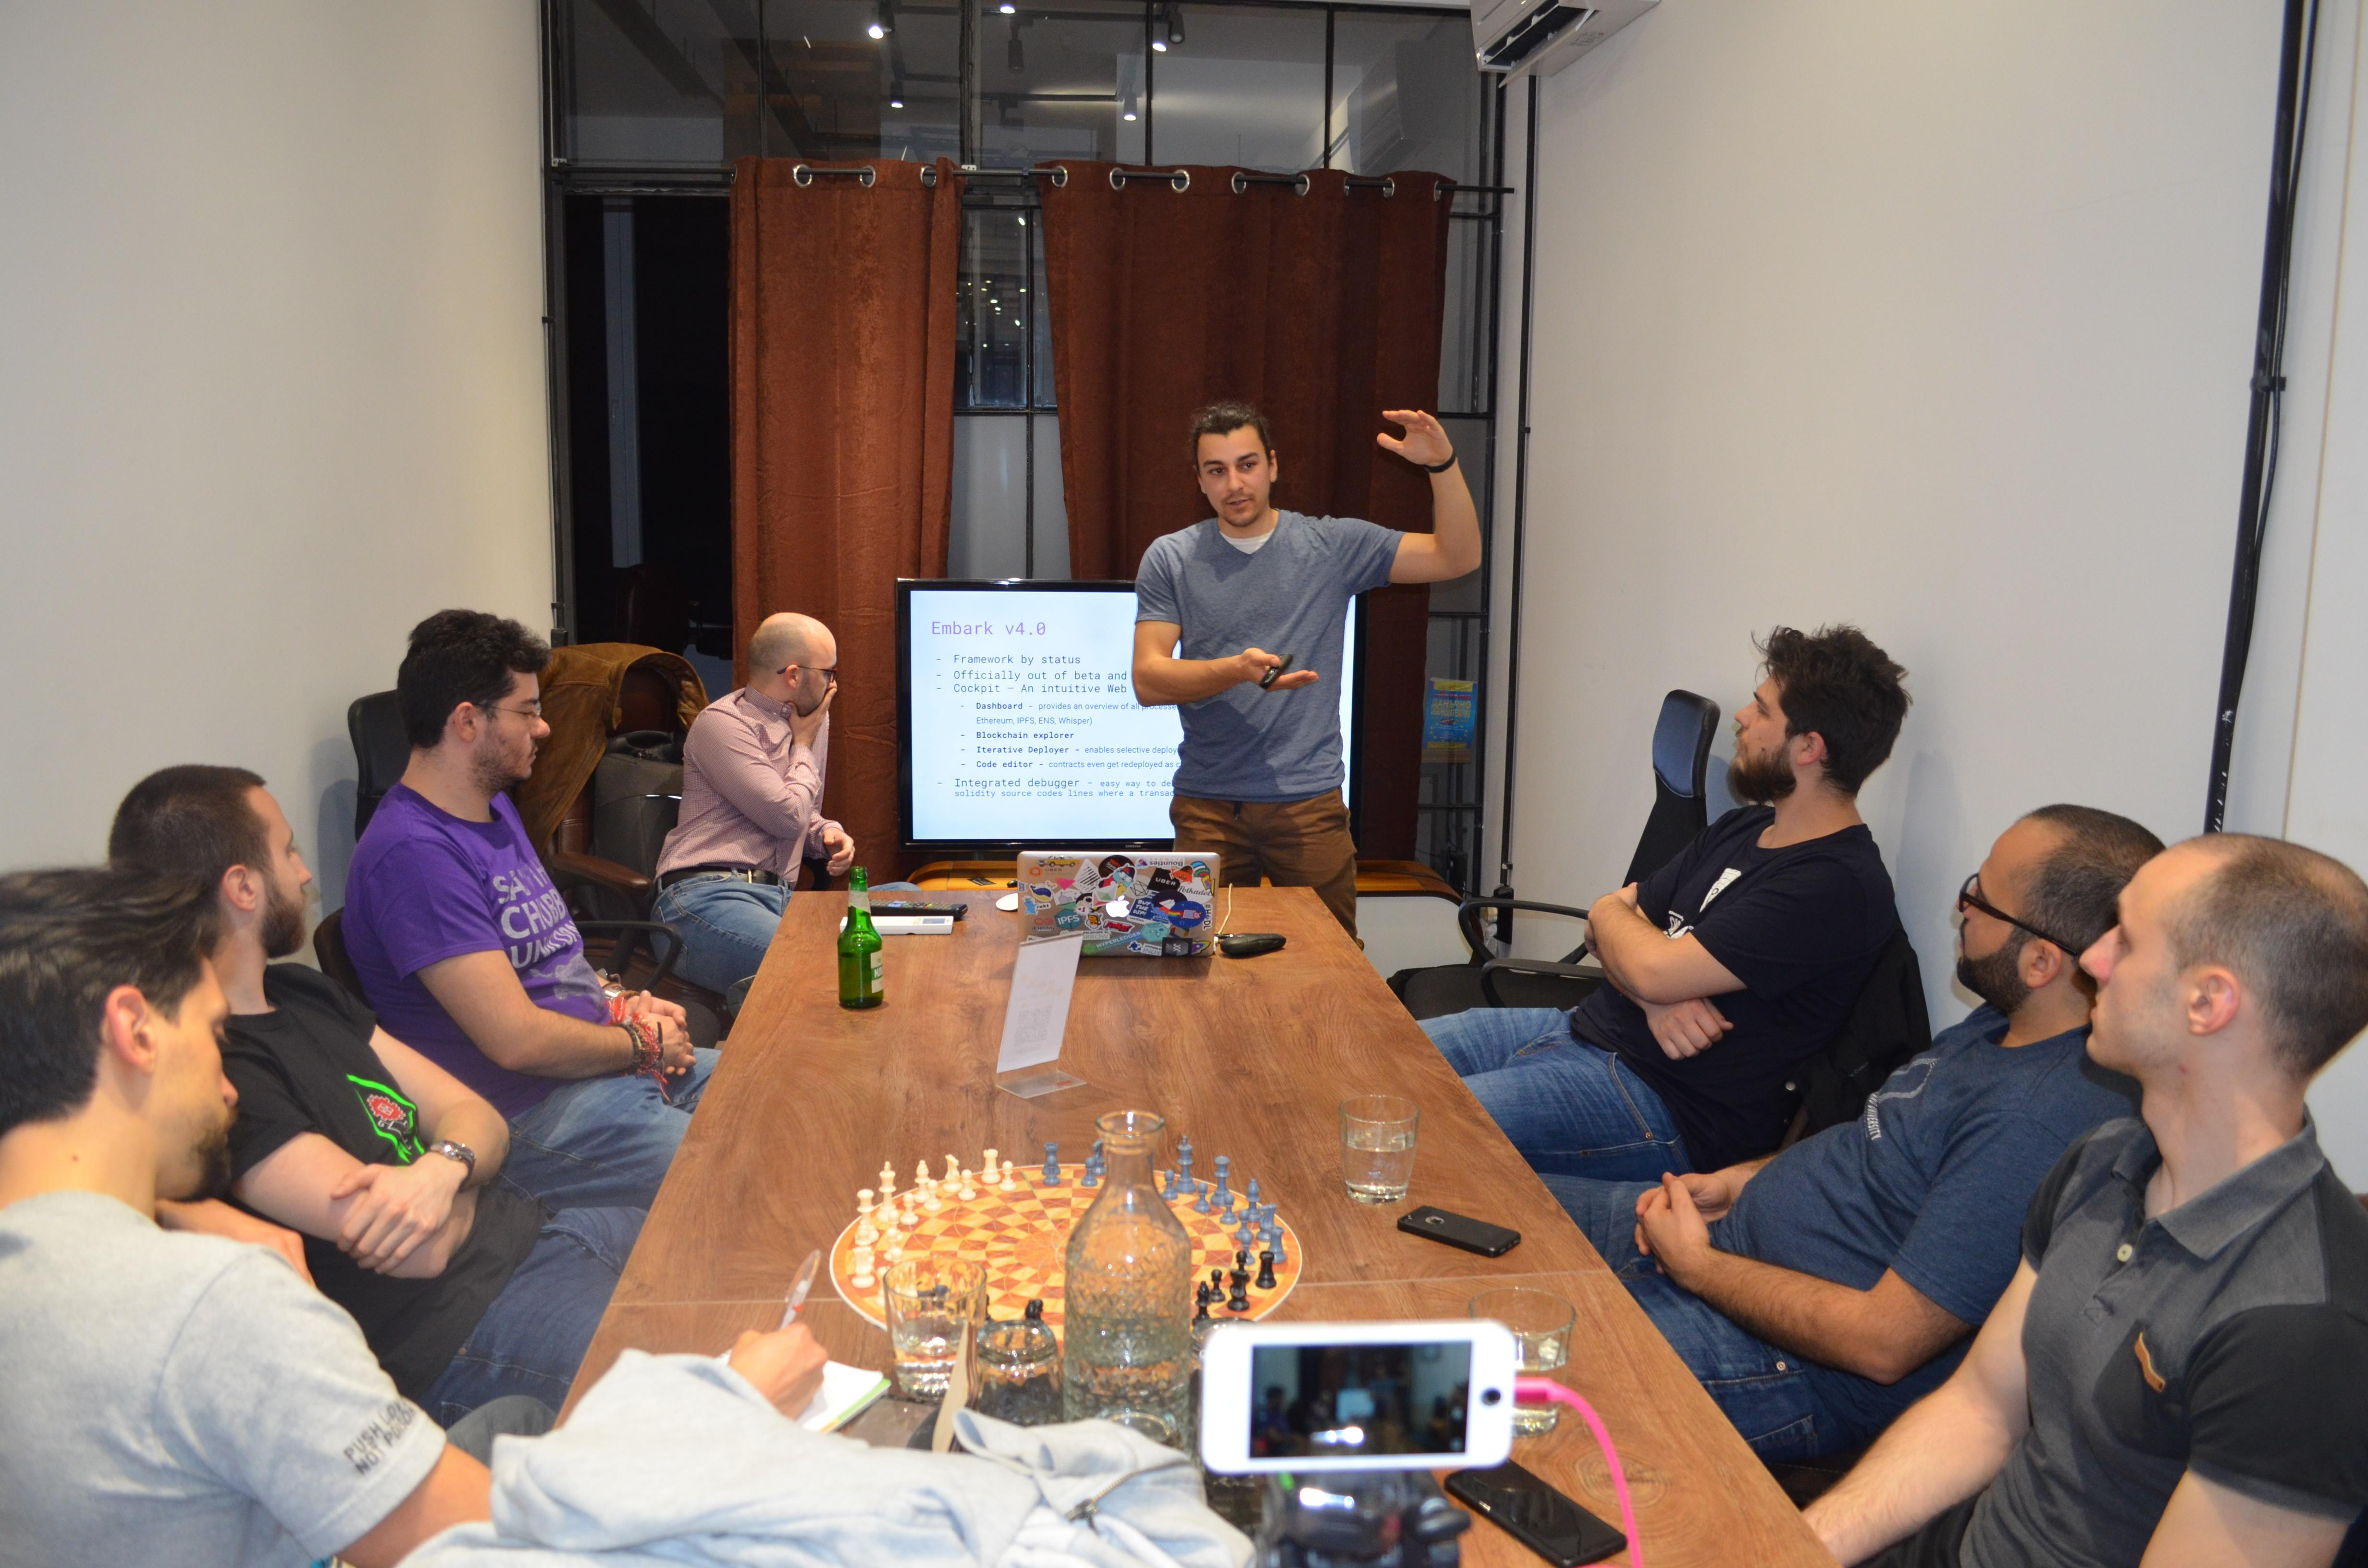 milen-radkov-blockchain-developers-meetup-tron